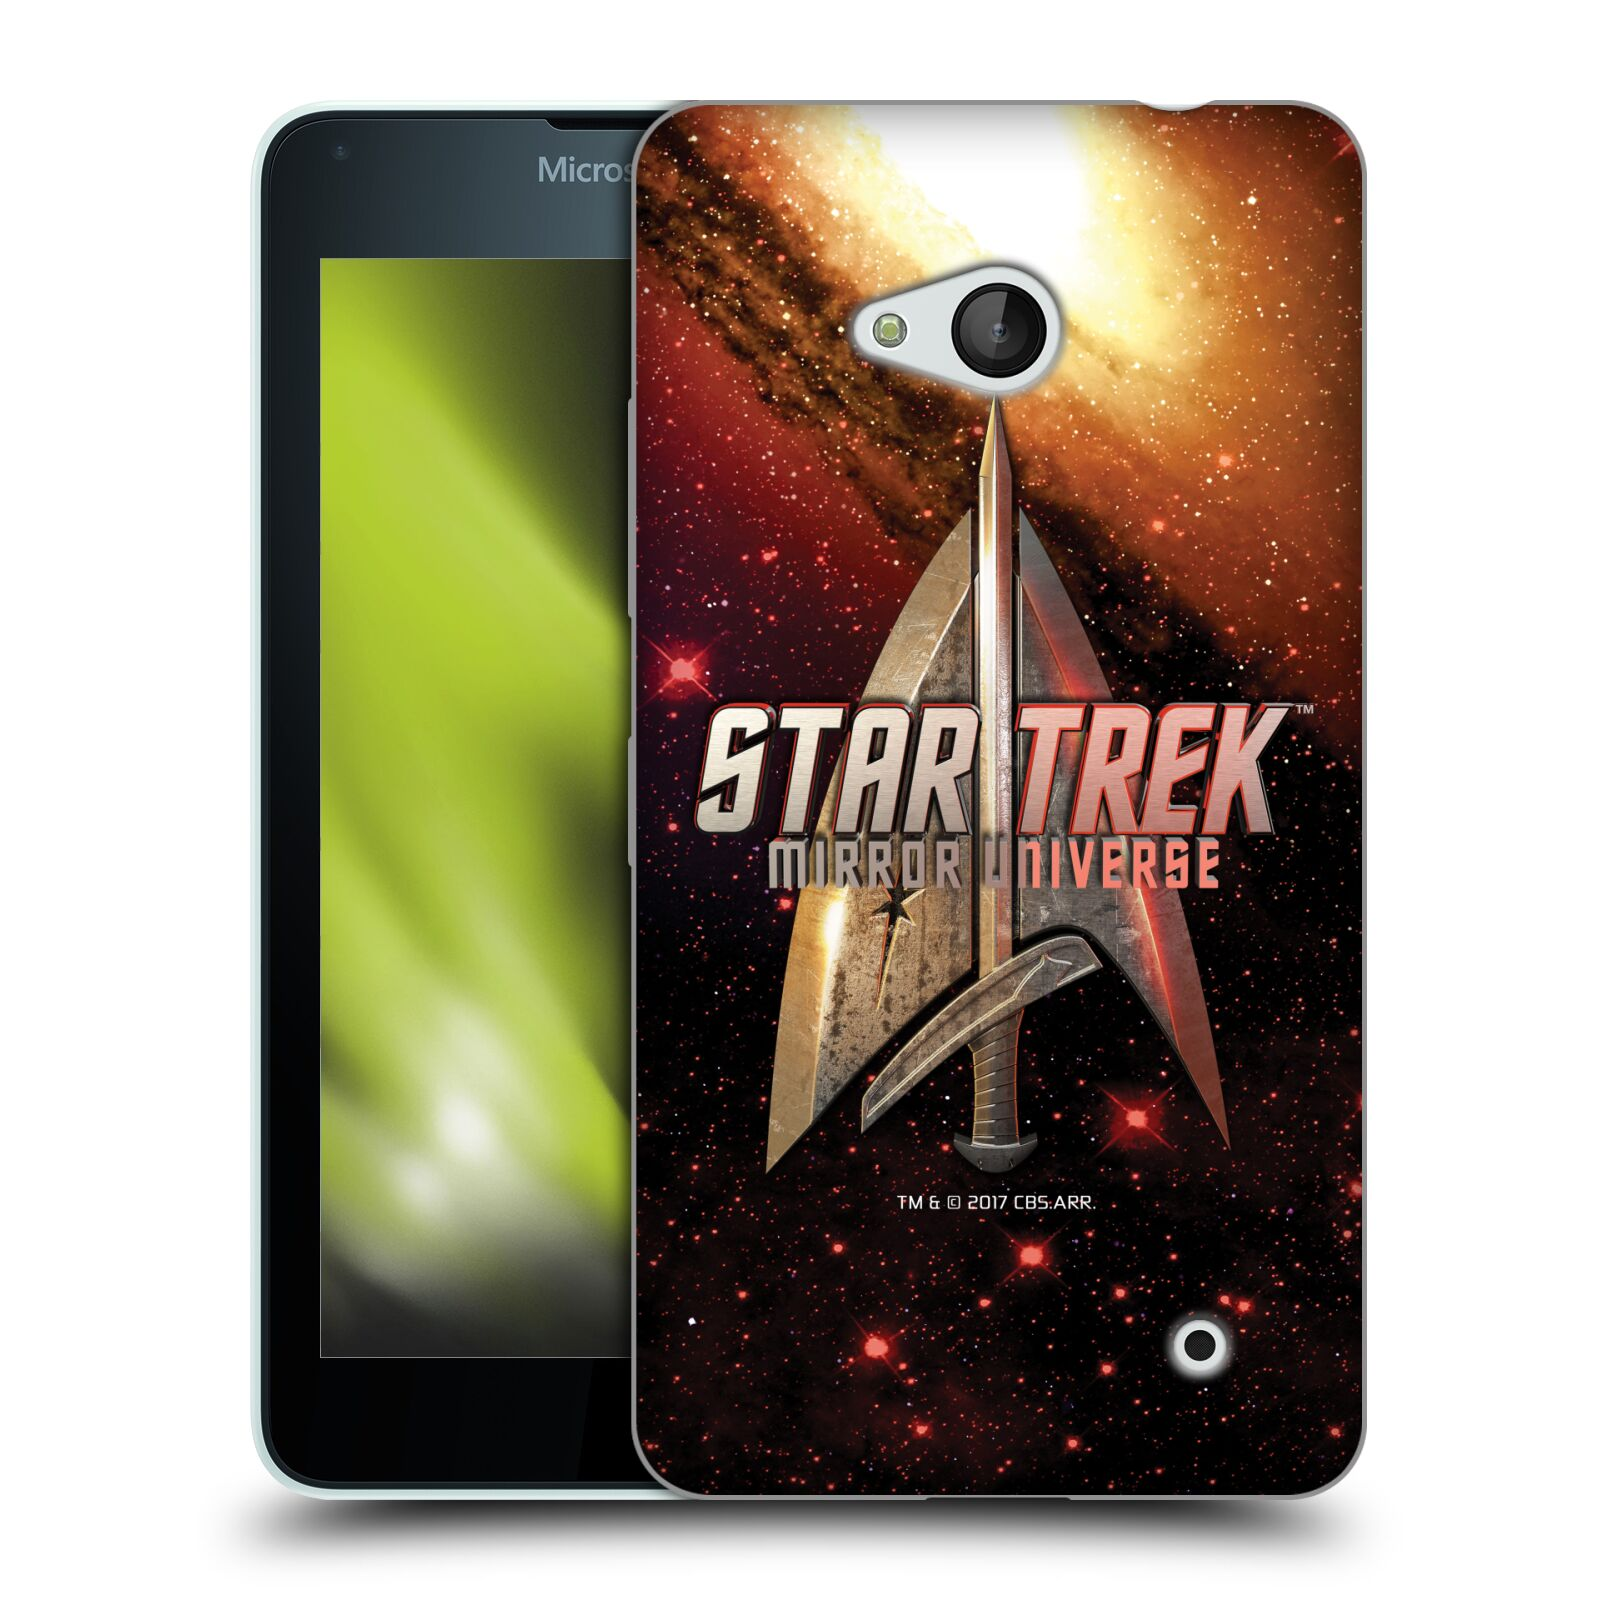 UFFICIALE-STAR-TREK-MIRROR-UNIVERSE-TNG-CASE-IN-GEL-PER-NOKIA-TELEFONI-1